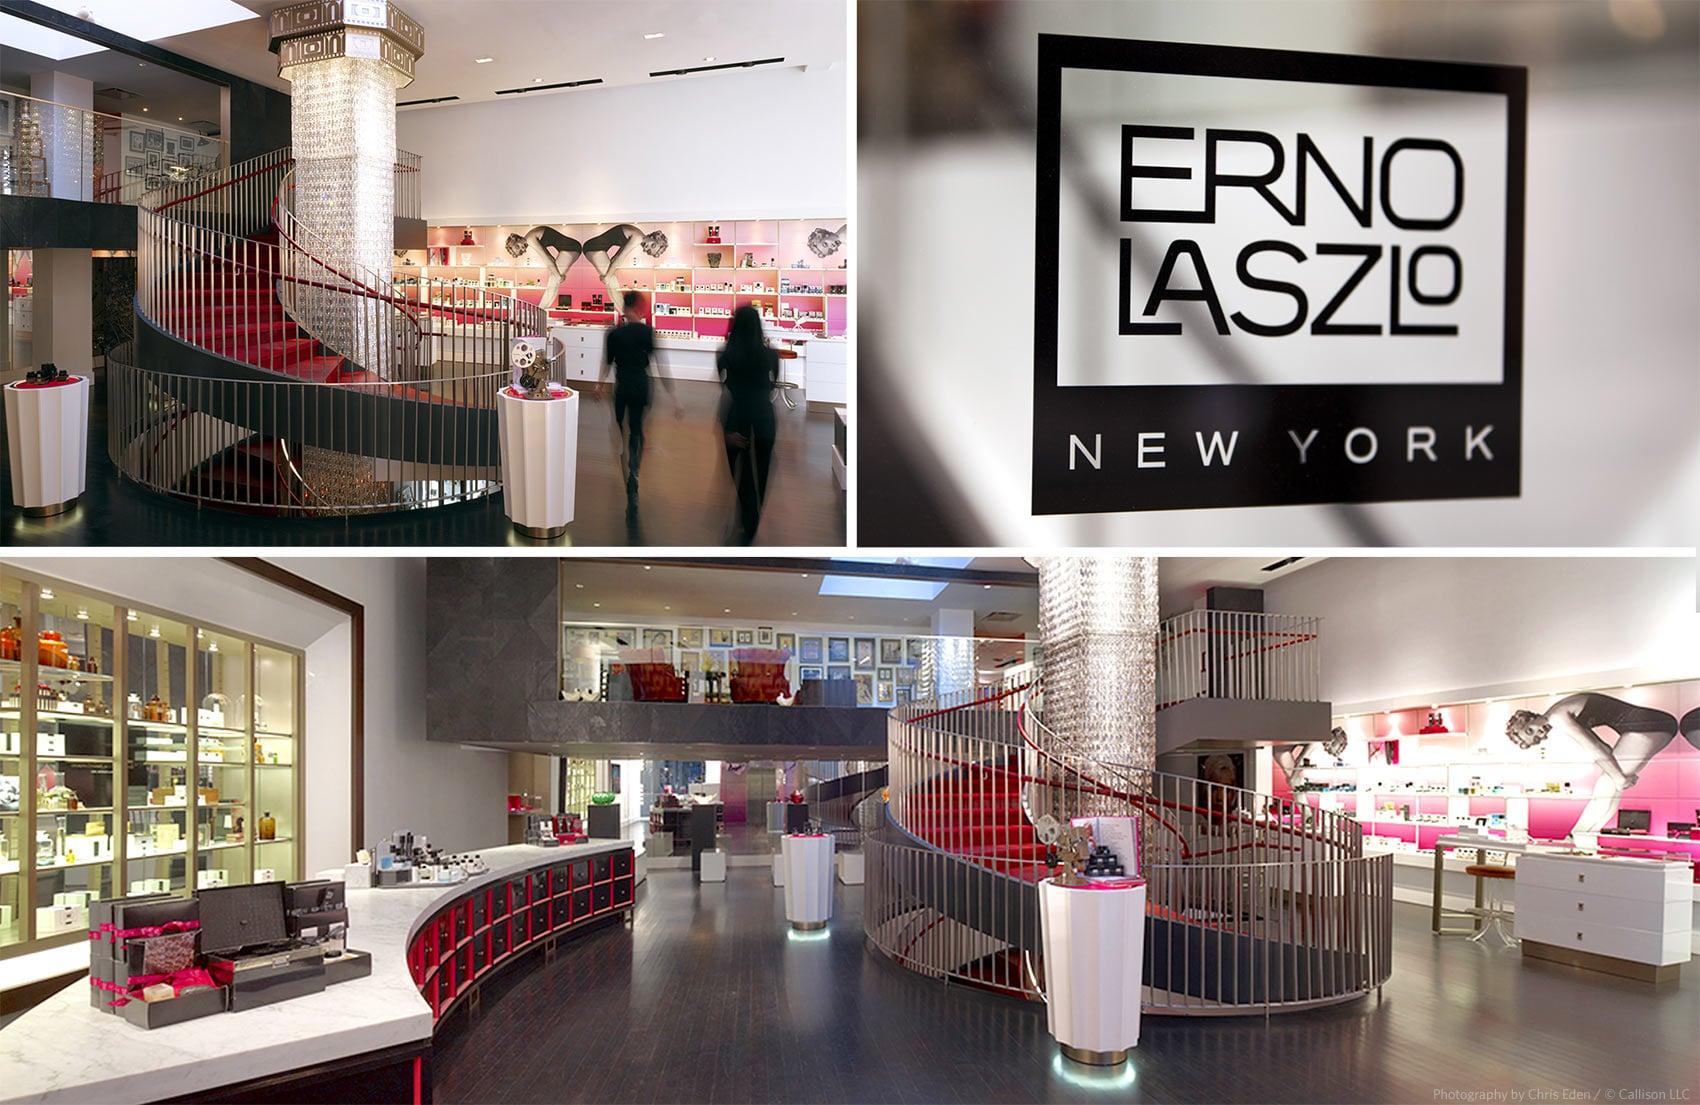 Erno Laszio SOHO NYC